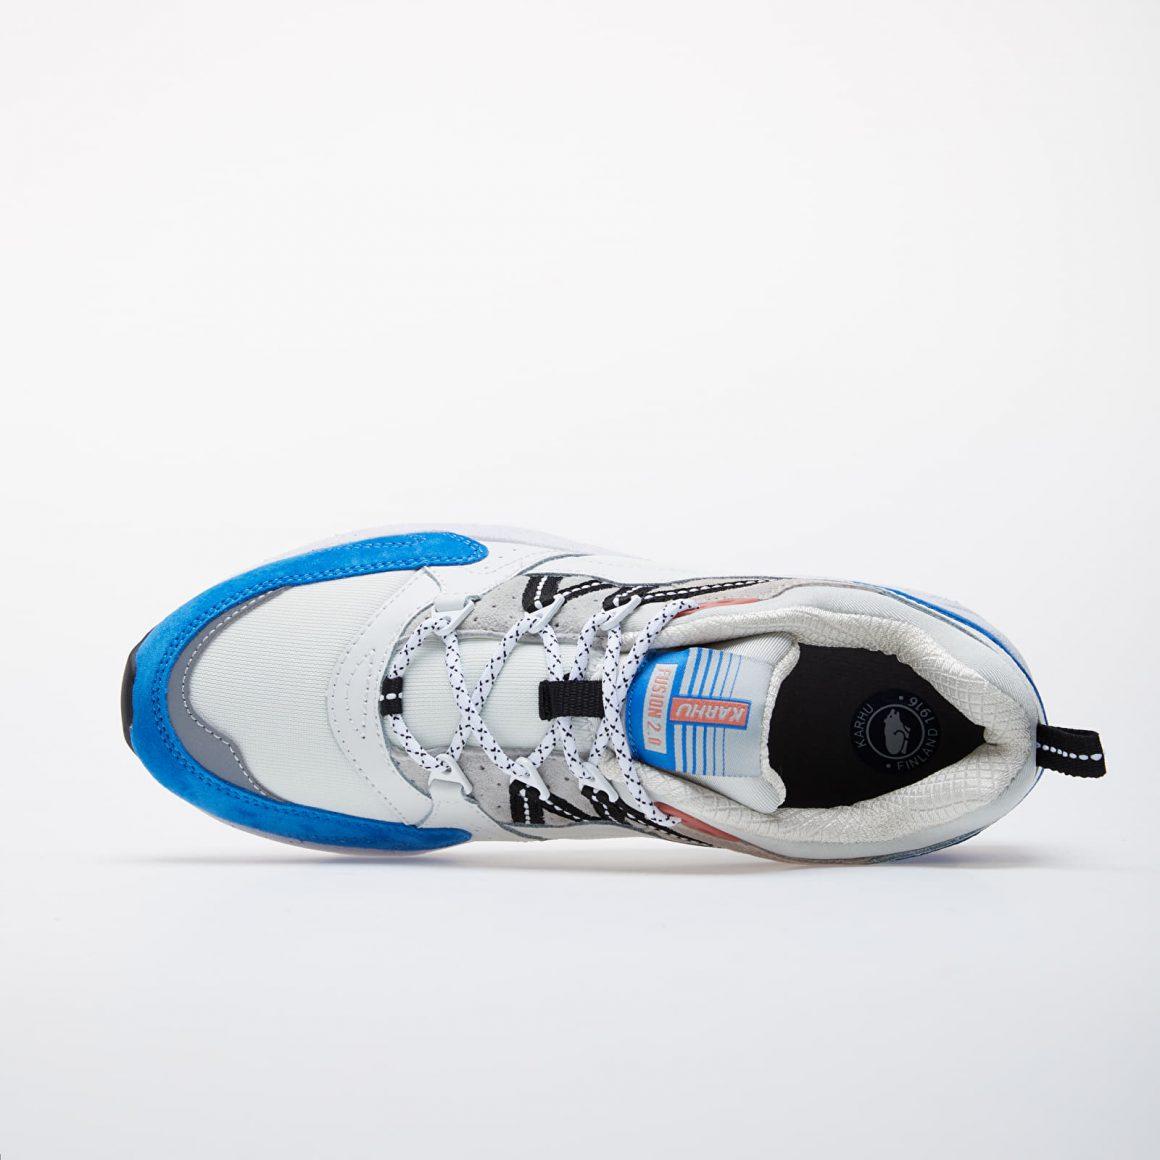 Karhu Fusion 2.0 ''Campanula/Bright White'' - Marathon Pack - F804080